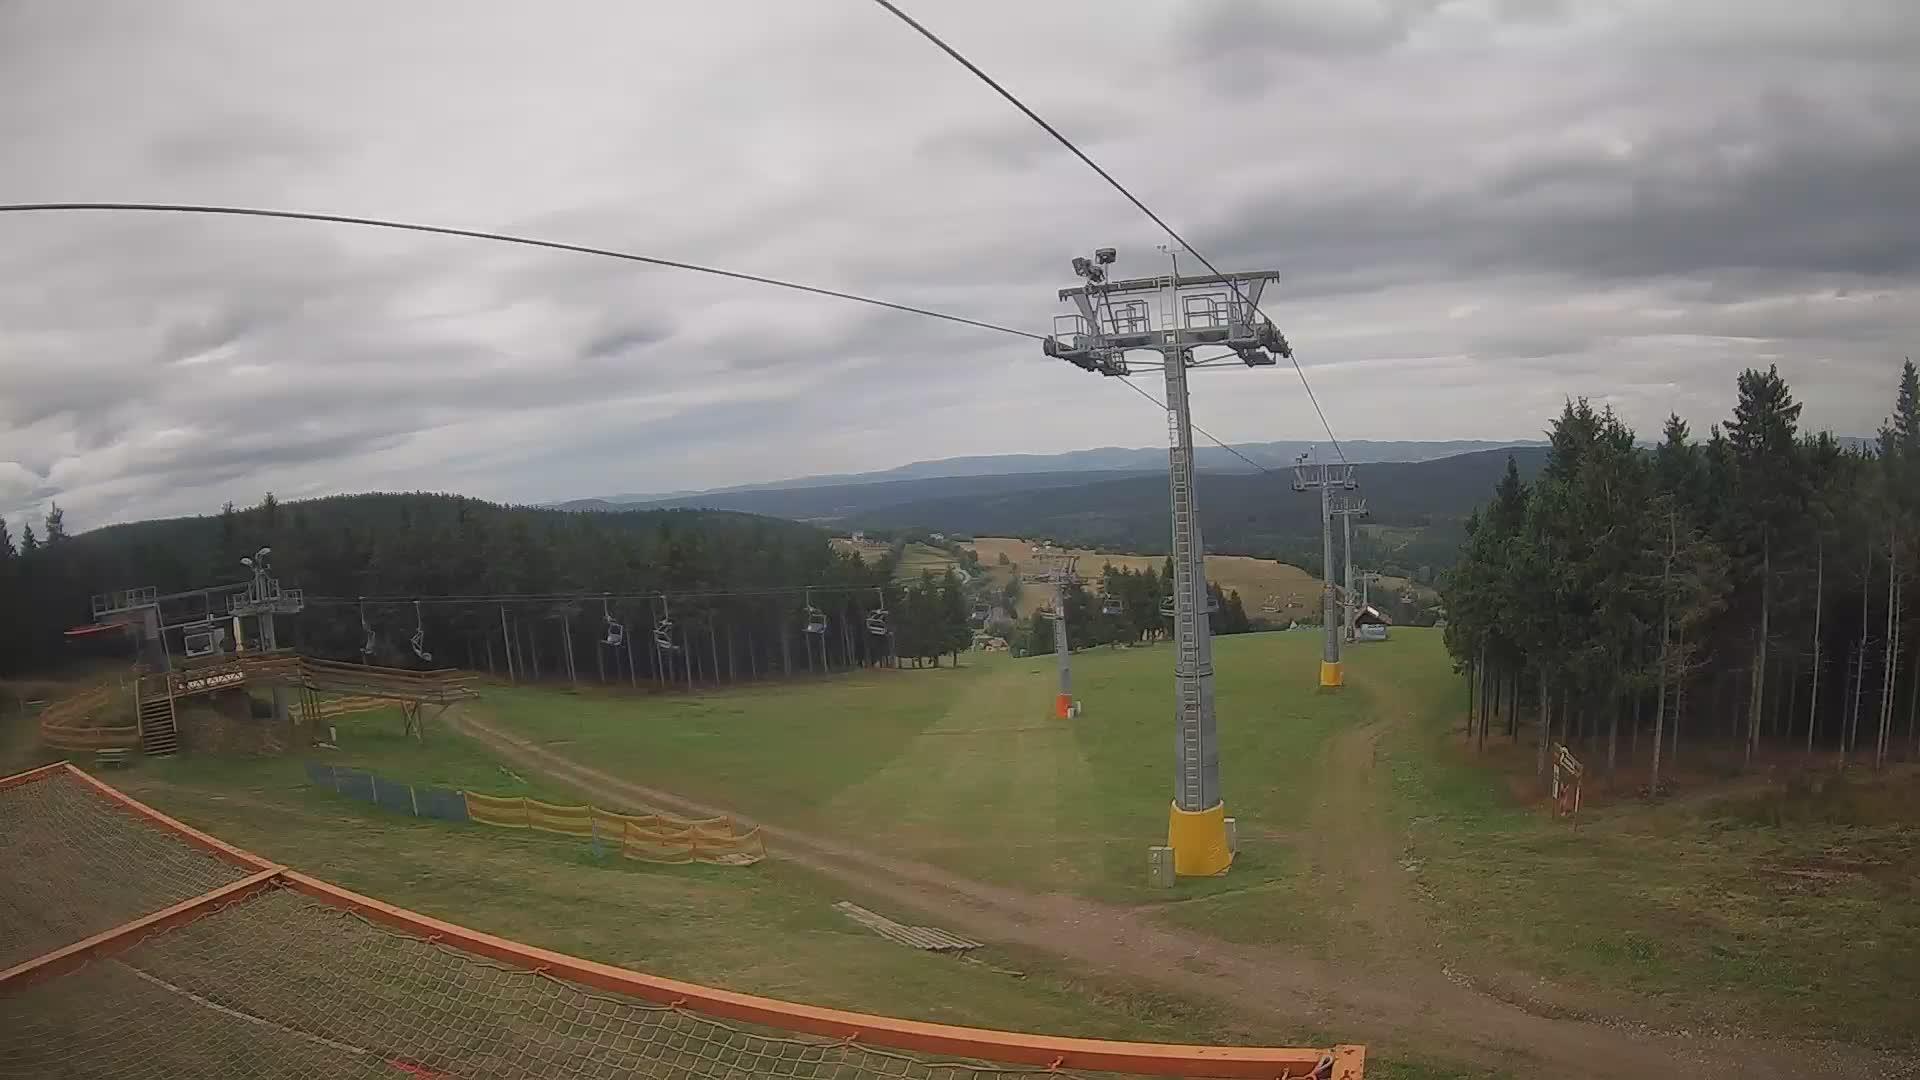 Stok narciarski Winterpol